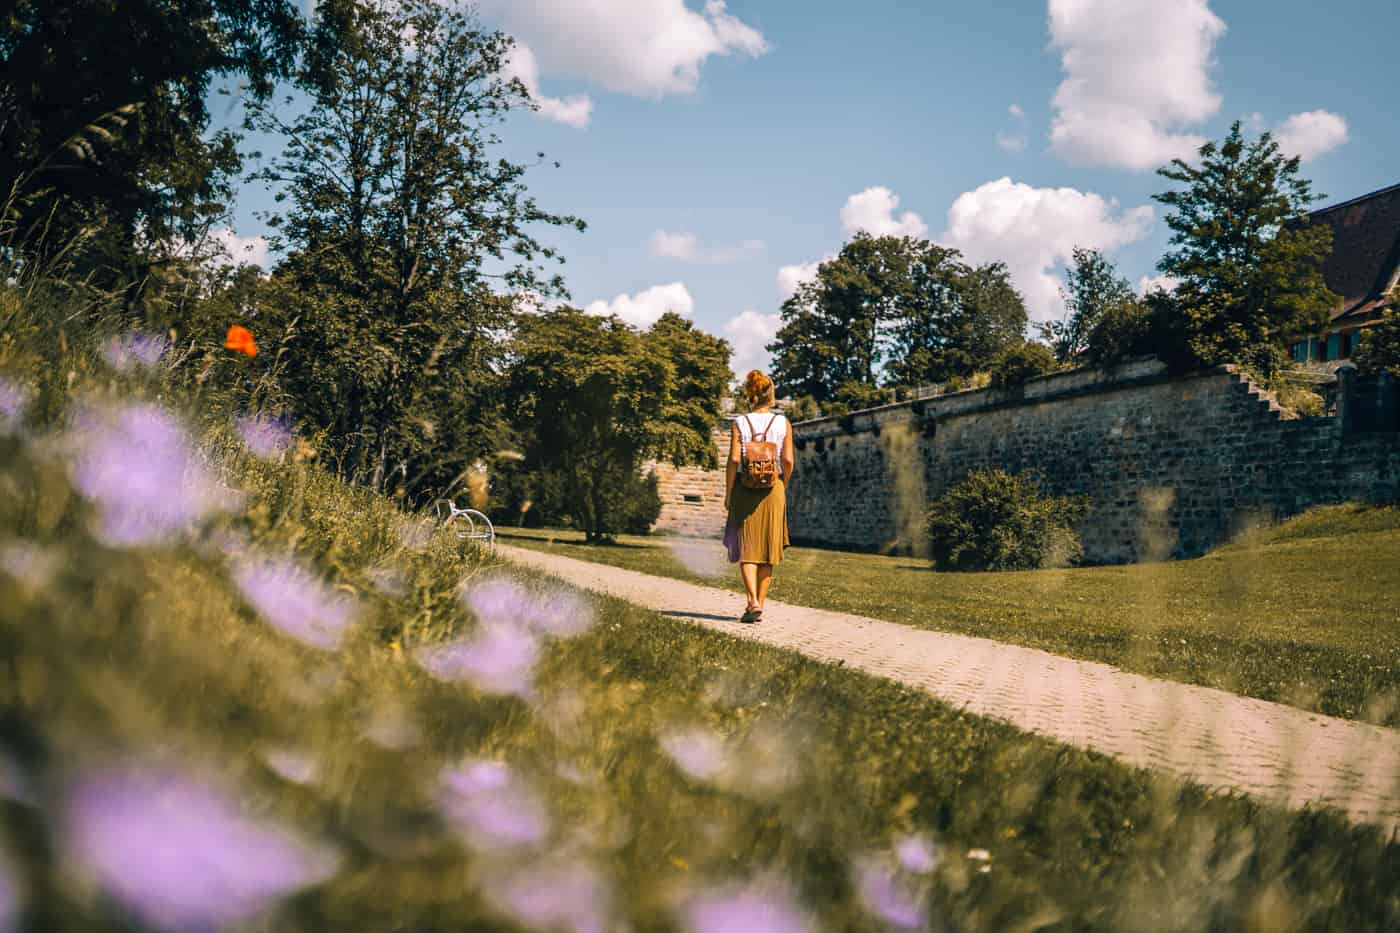 Forchheim in Oberfranken - Spaziergang an der Stadtmauer